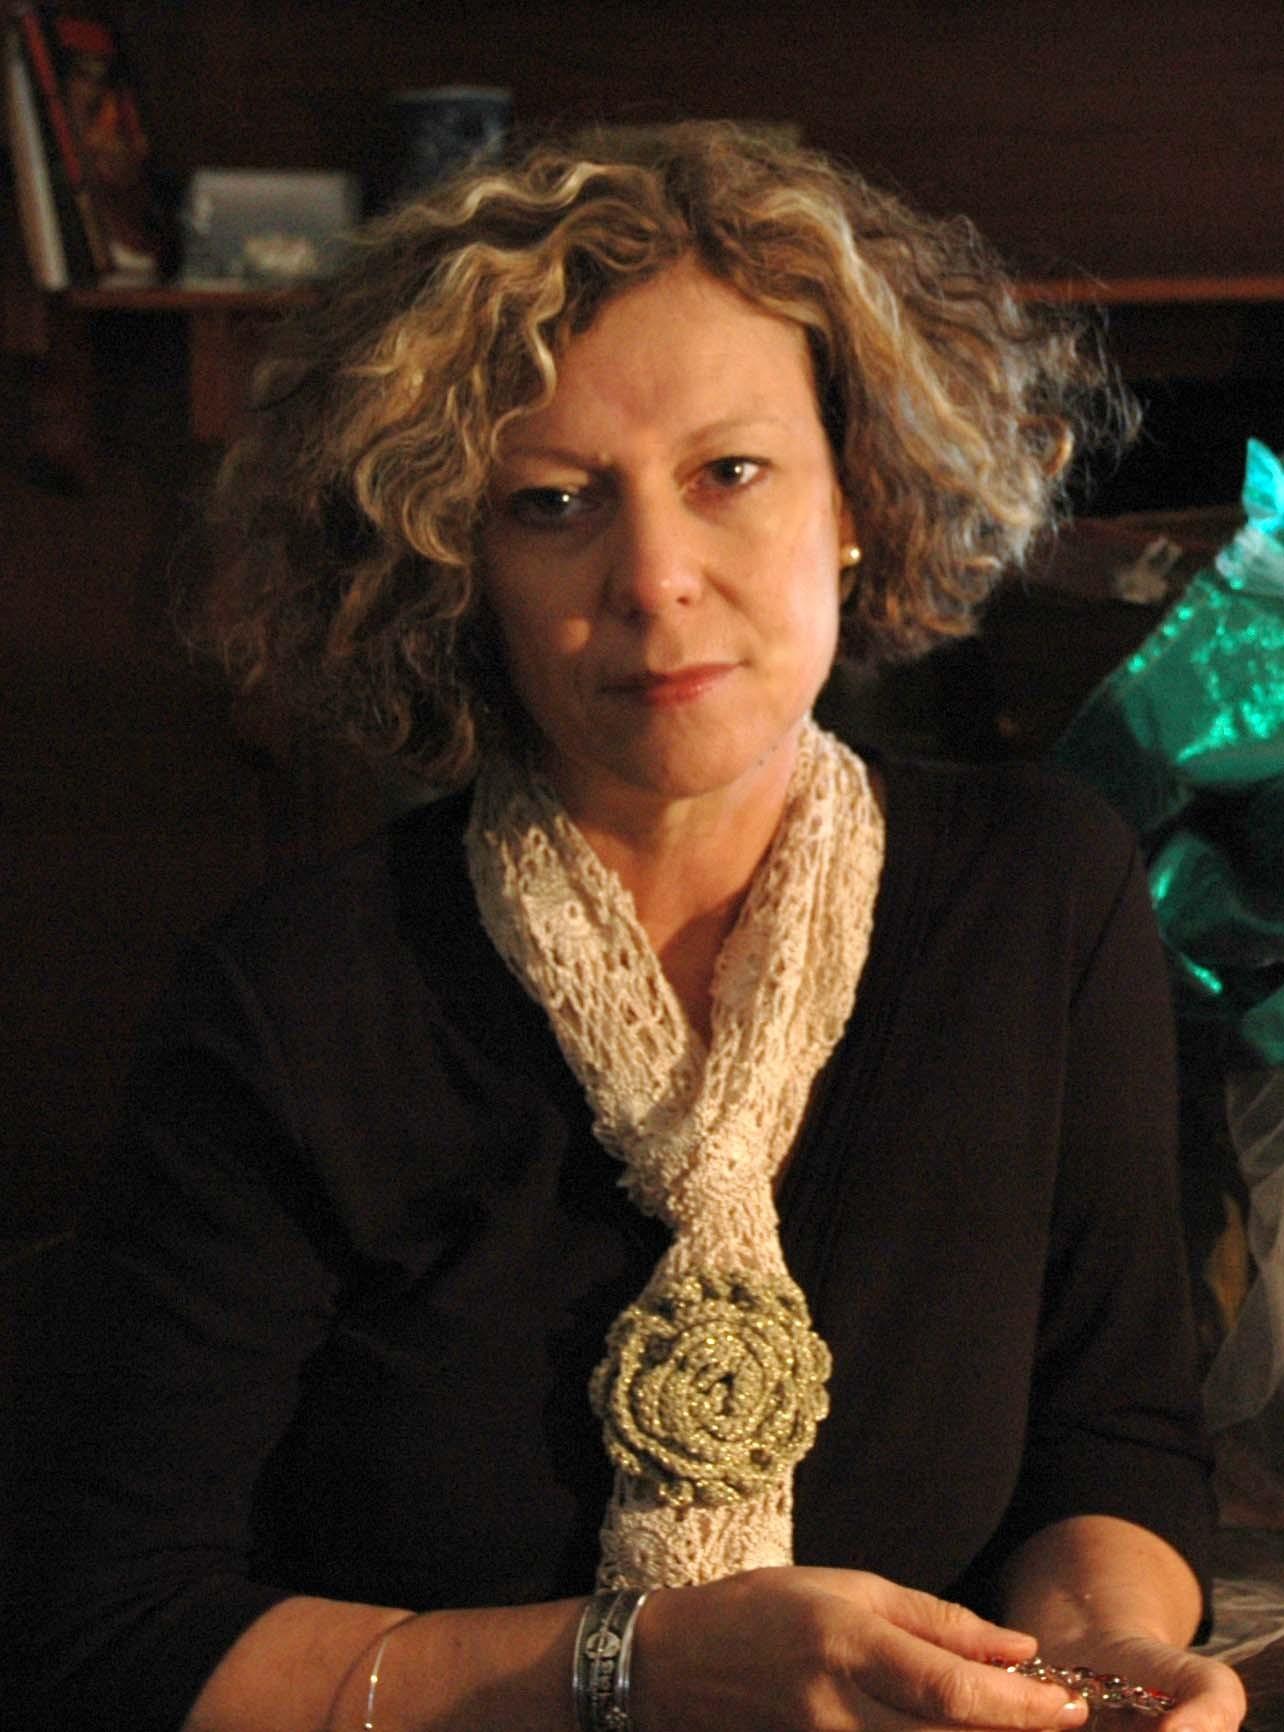 PREFERRED Author photo Carol Lefevre 3 by Chris Lefevre.jpg